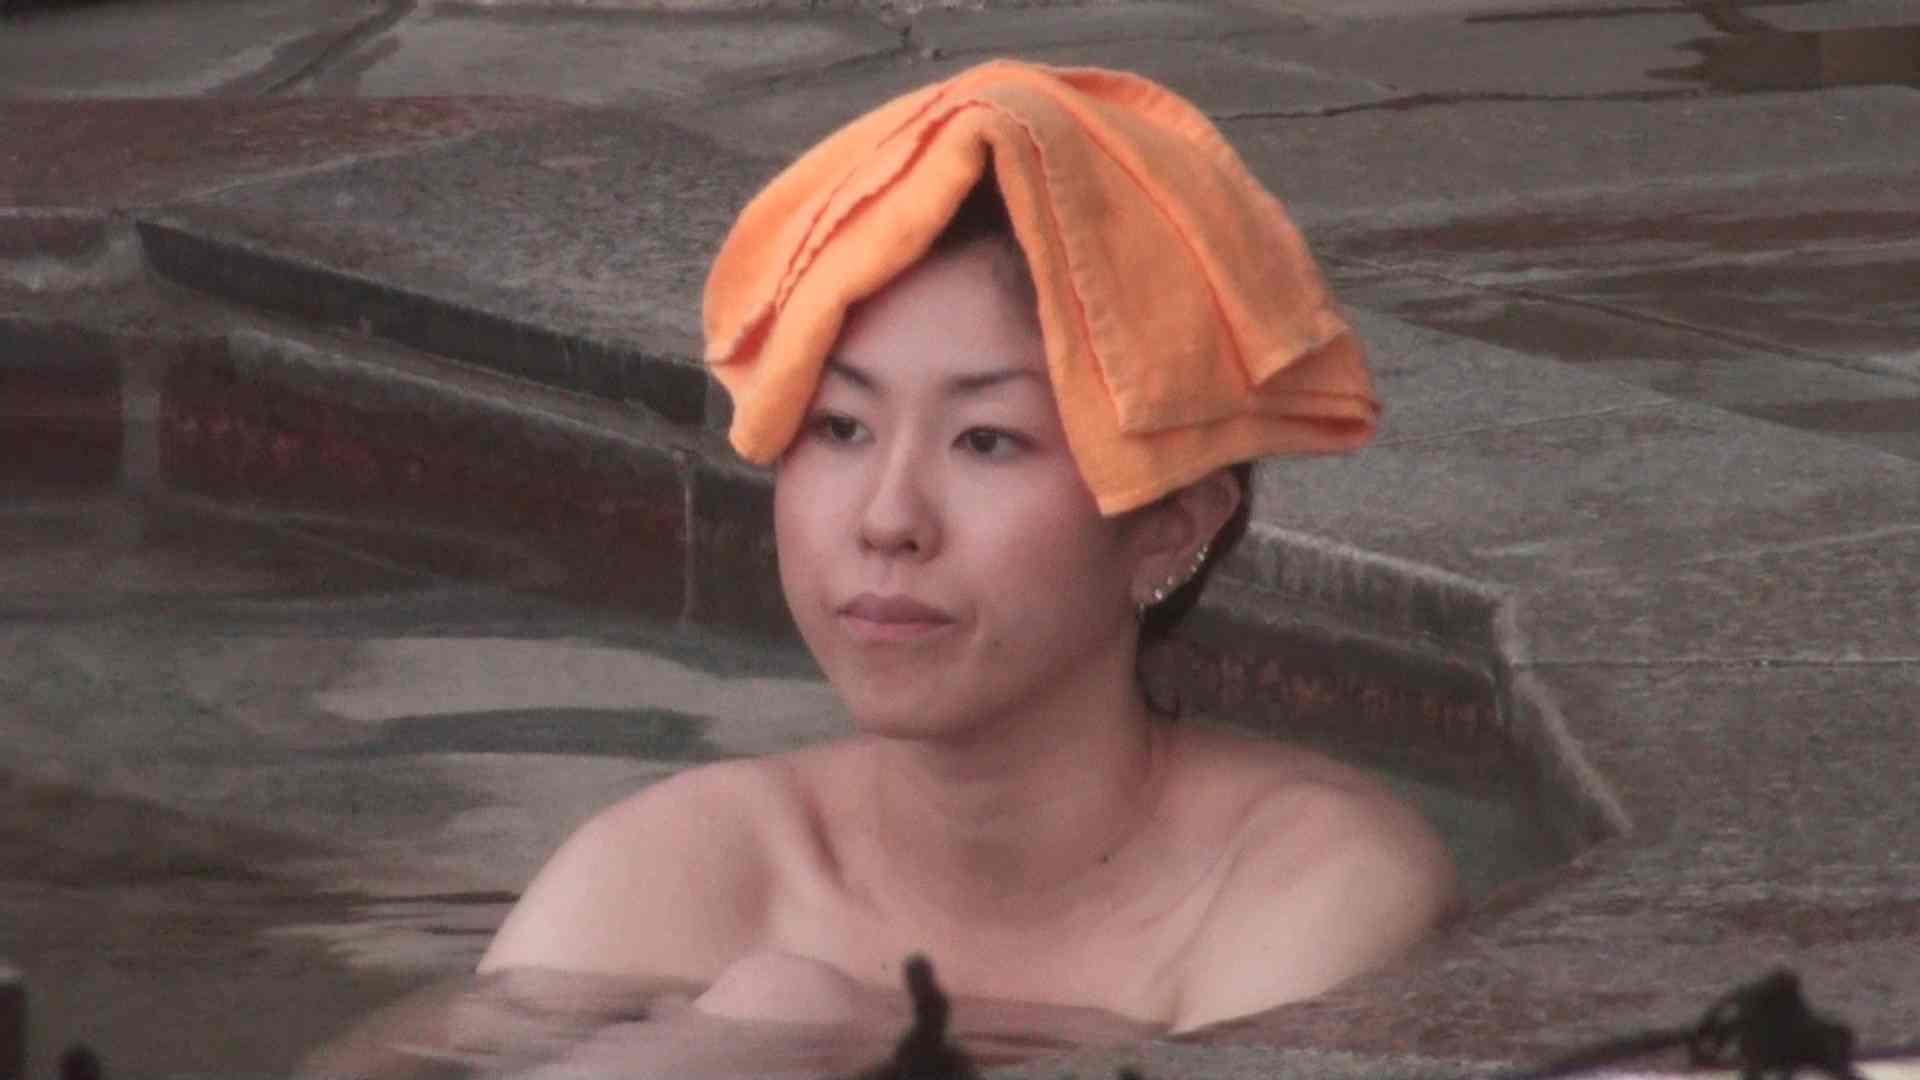 Aquaな露天風呂Vol.135 盗撮シリーズ | 露天風呂編  84PIX 73